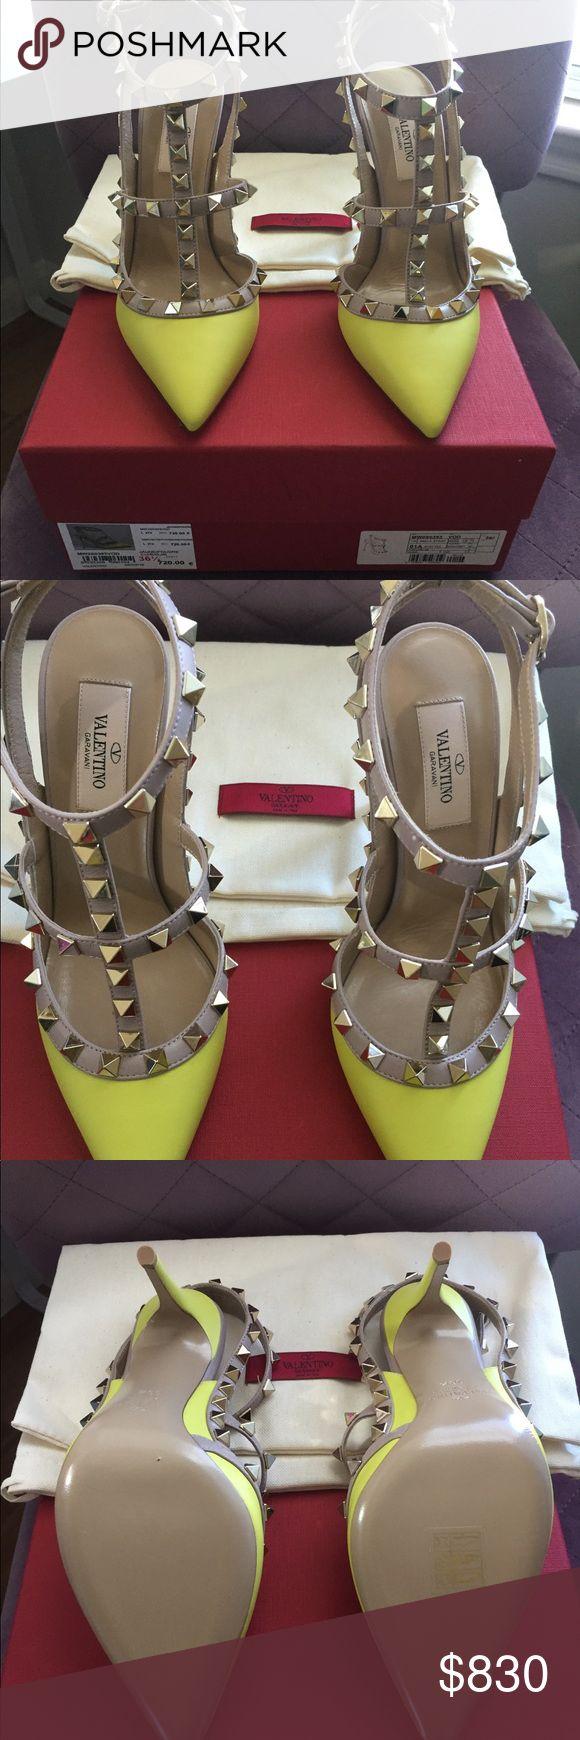 Valentino studded heels A brand new yellow Valentino studded heels with dust bag. Valentino Shoes Heels